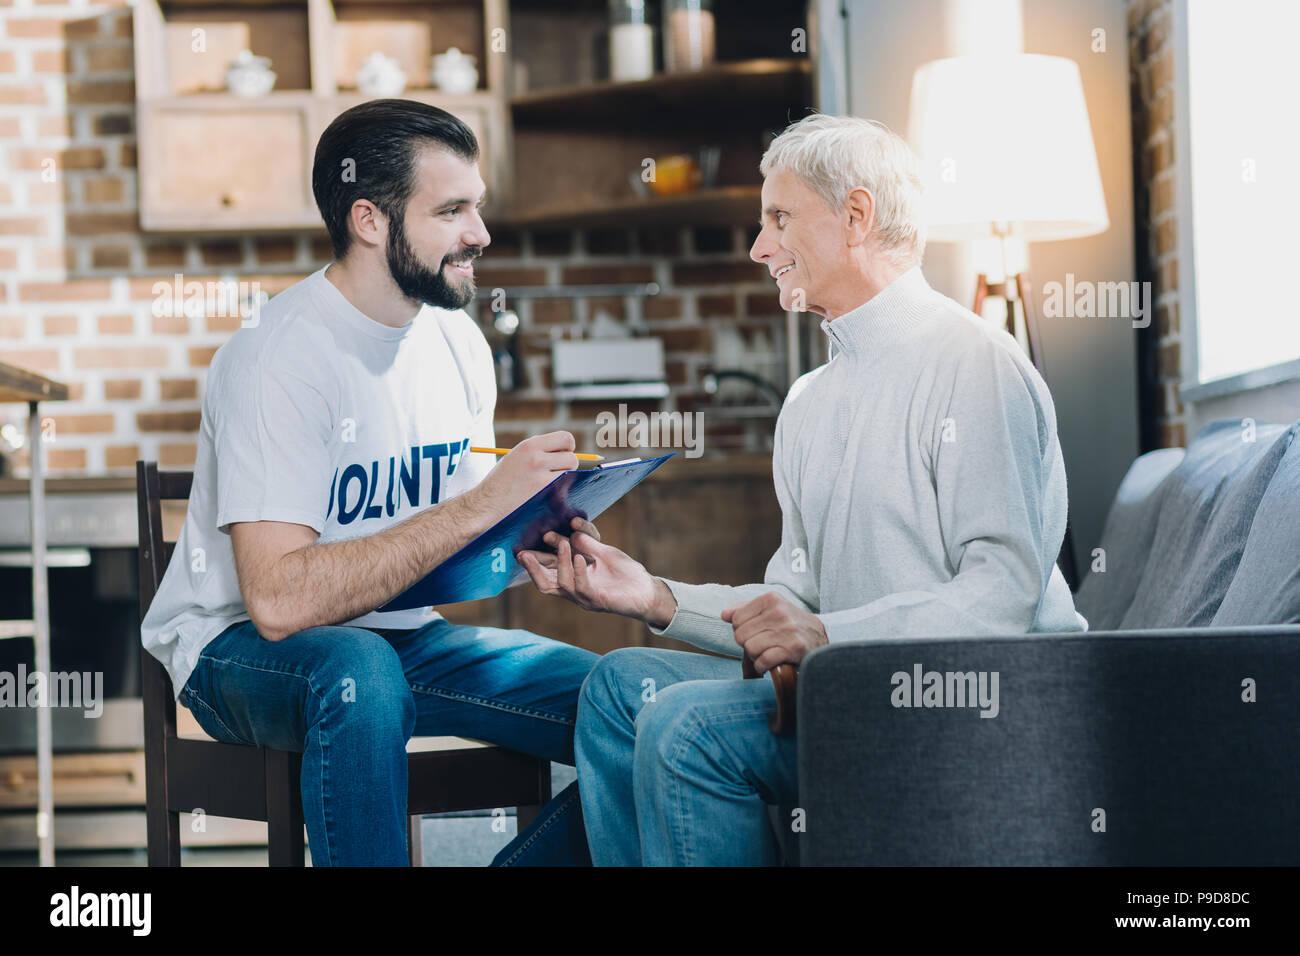 Alert volunteer talking with an old man - Stock Image